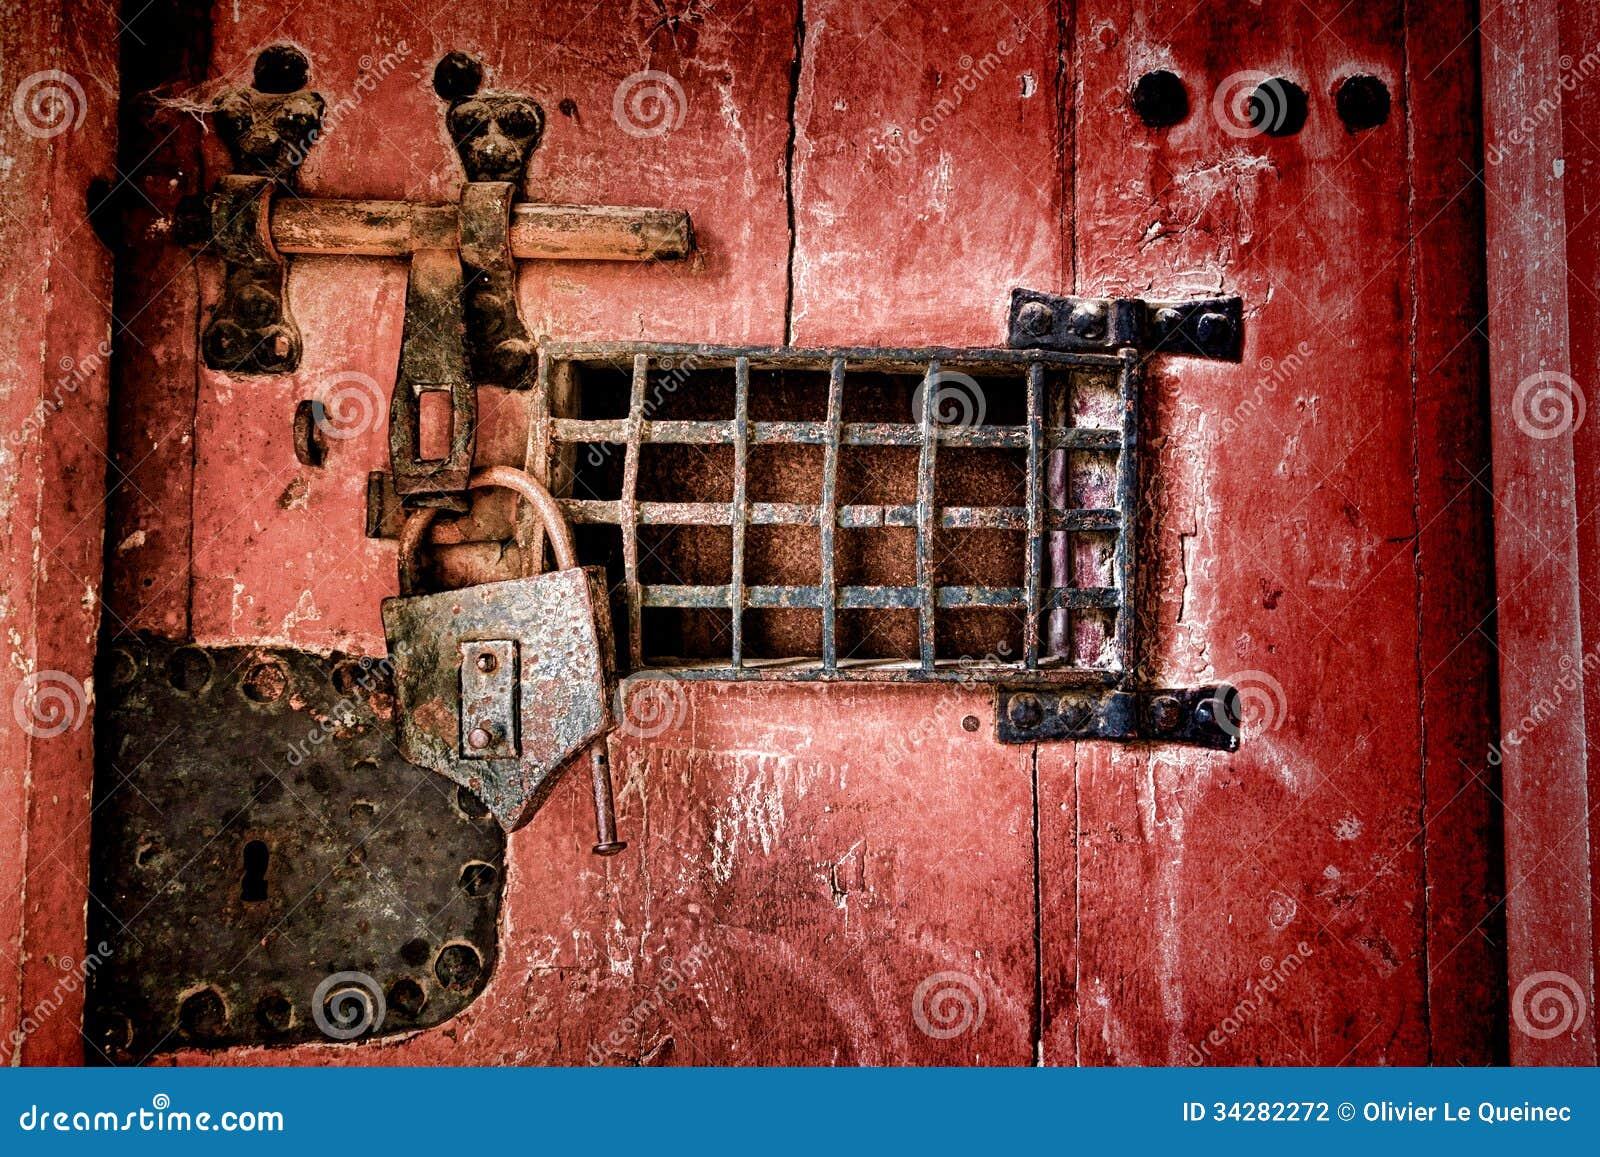 Old Lock And Locking Hardware On Antique Jail Door Stock